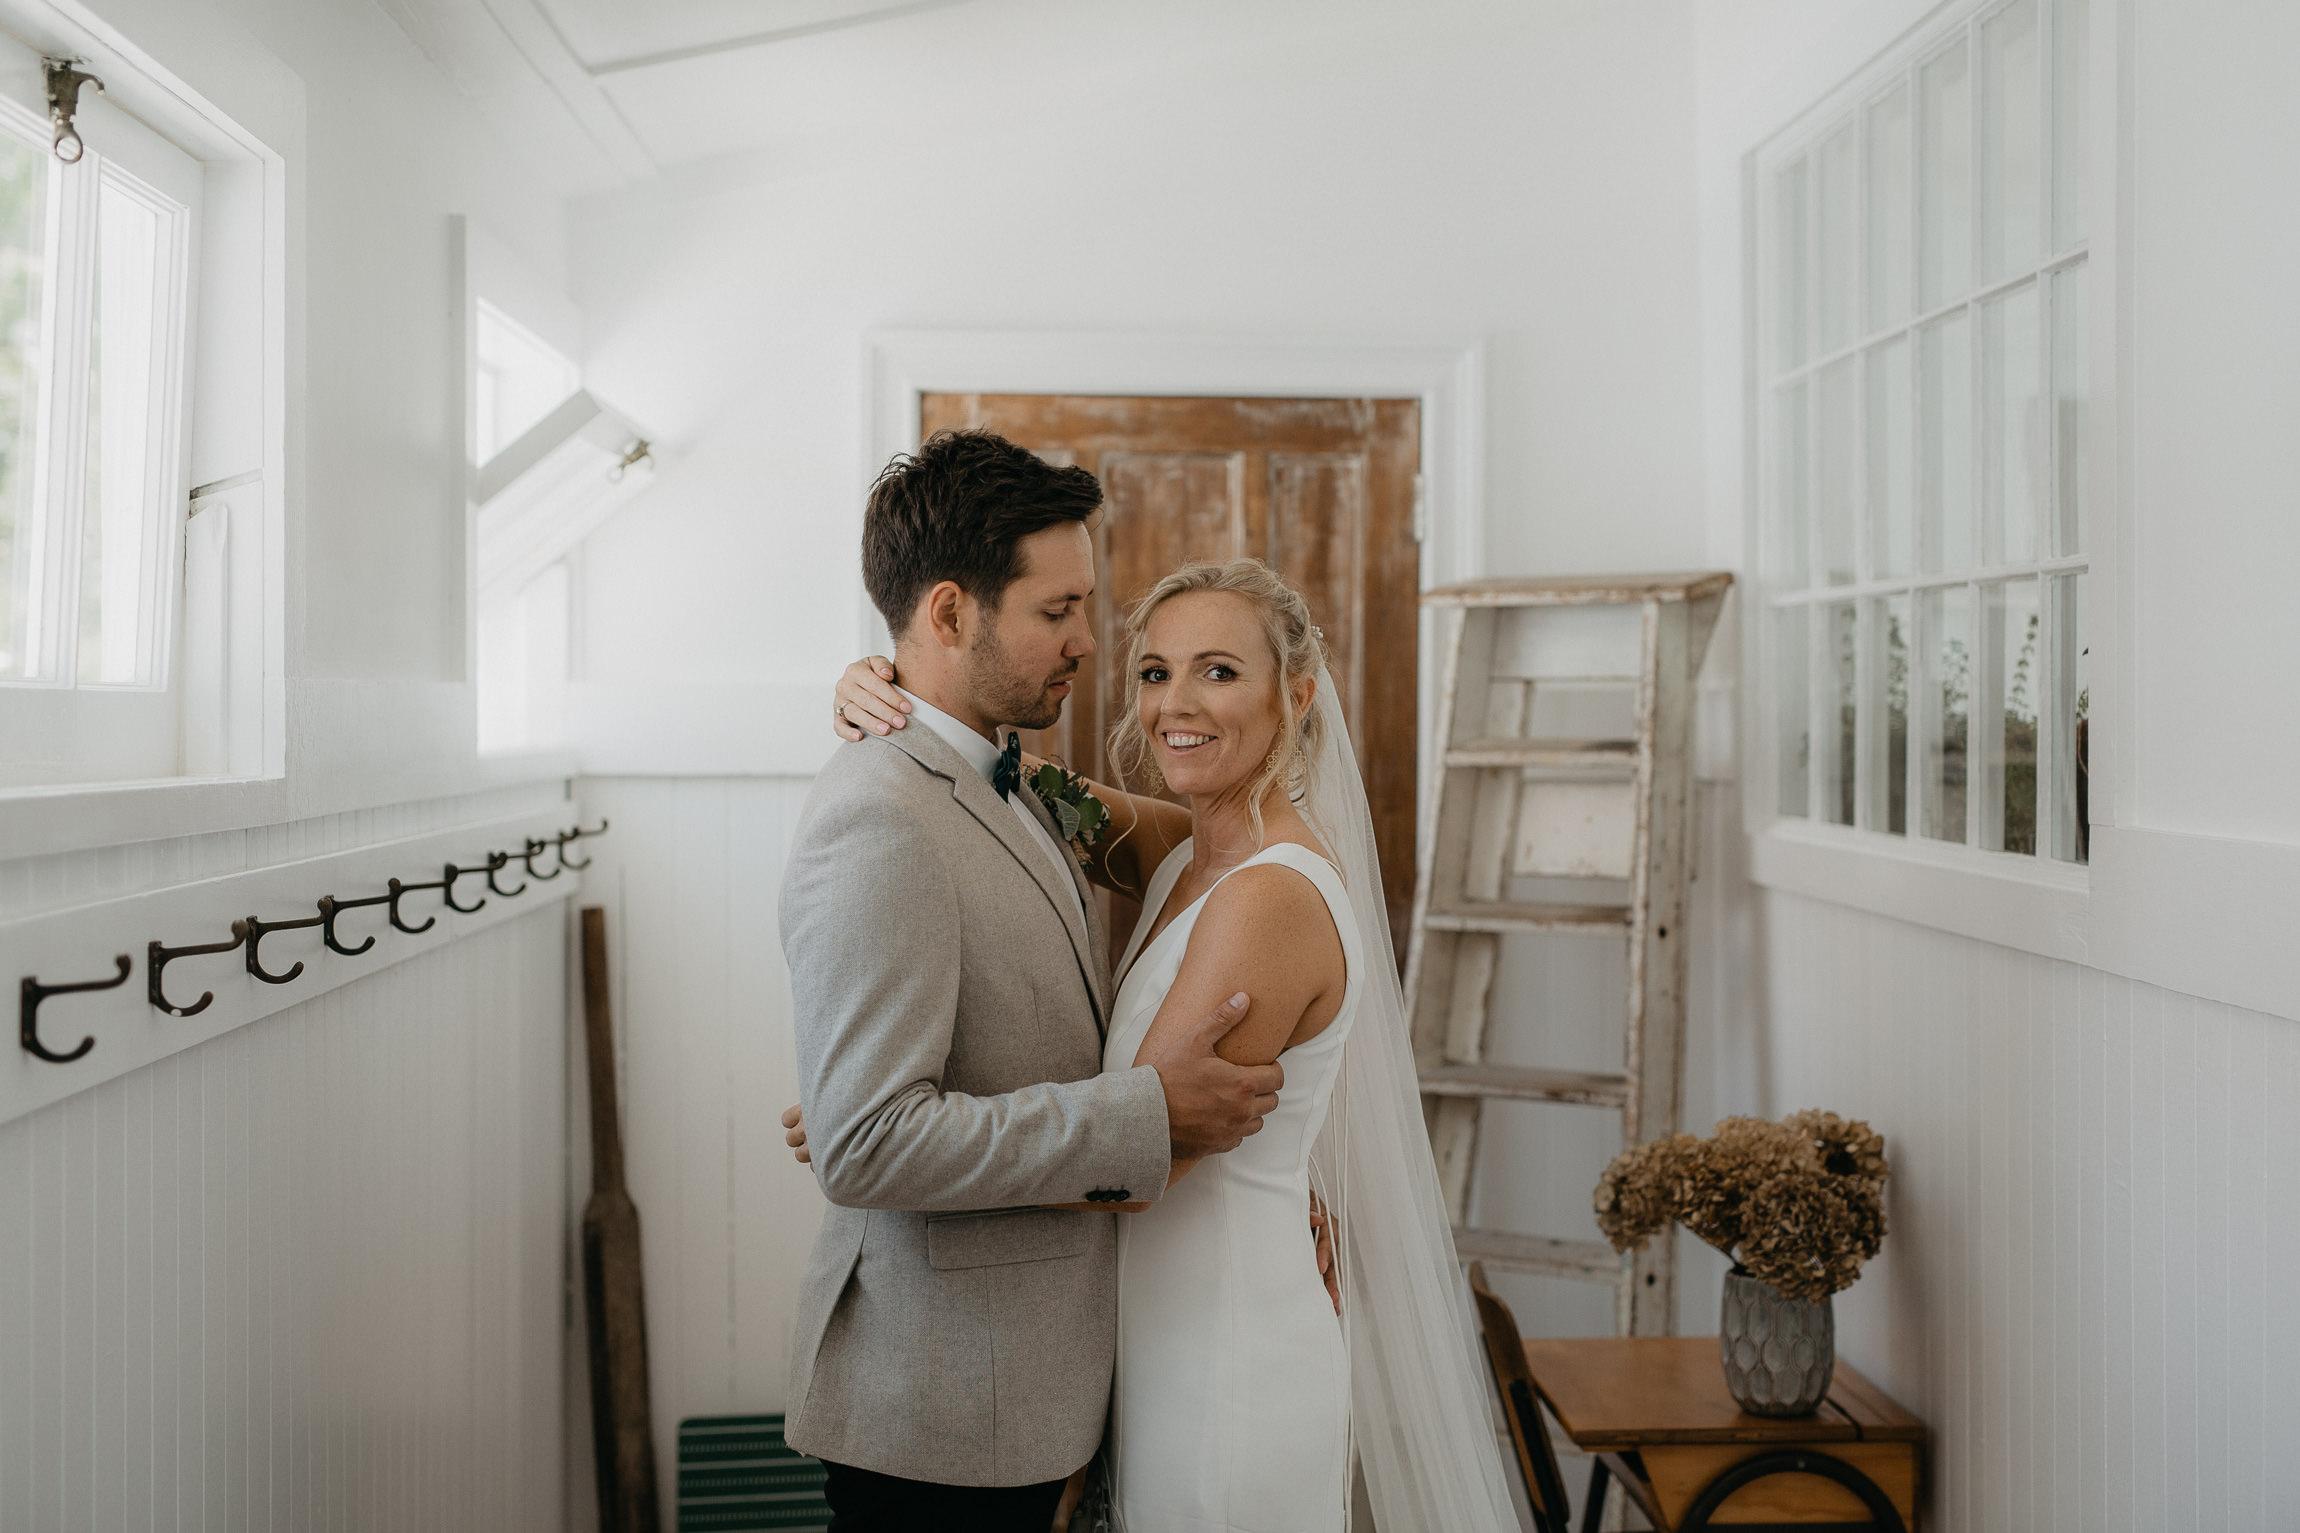 oldforestschool-wedding-blog-66.jpg